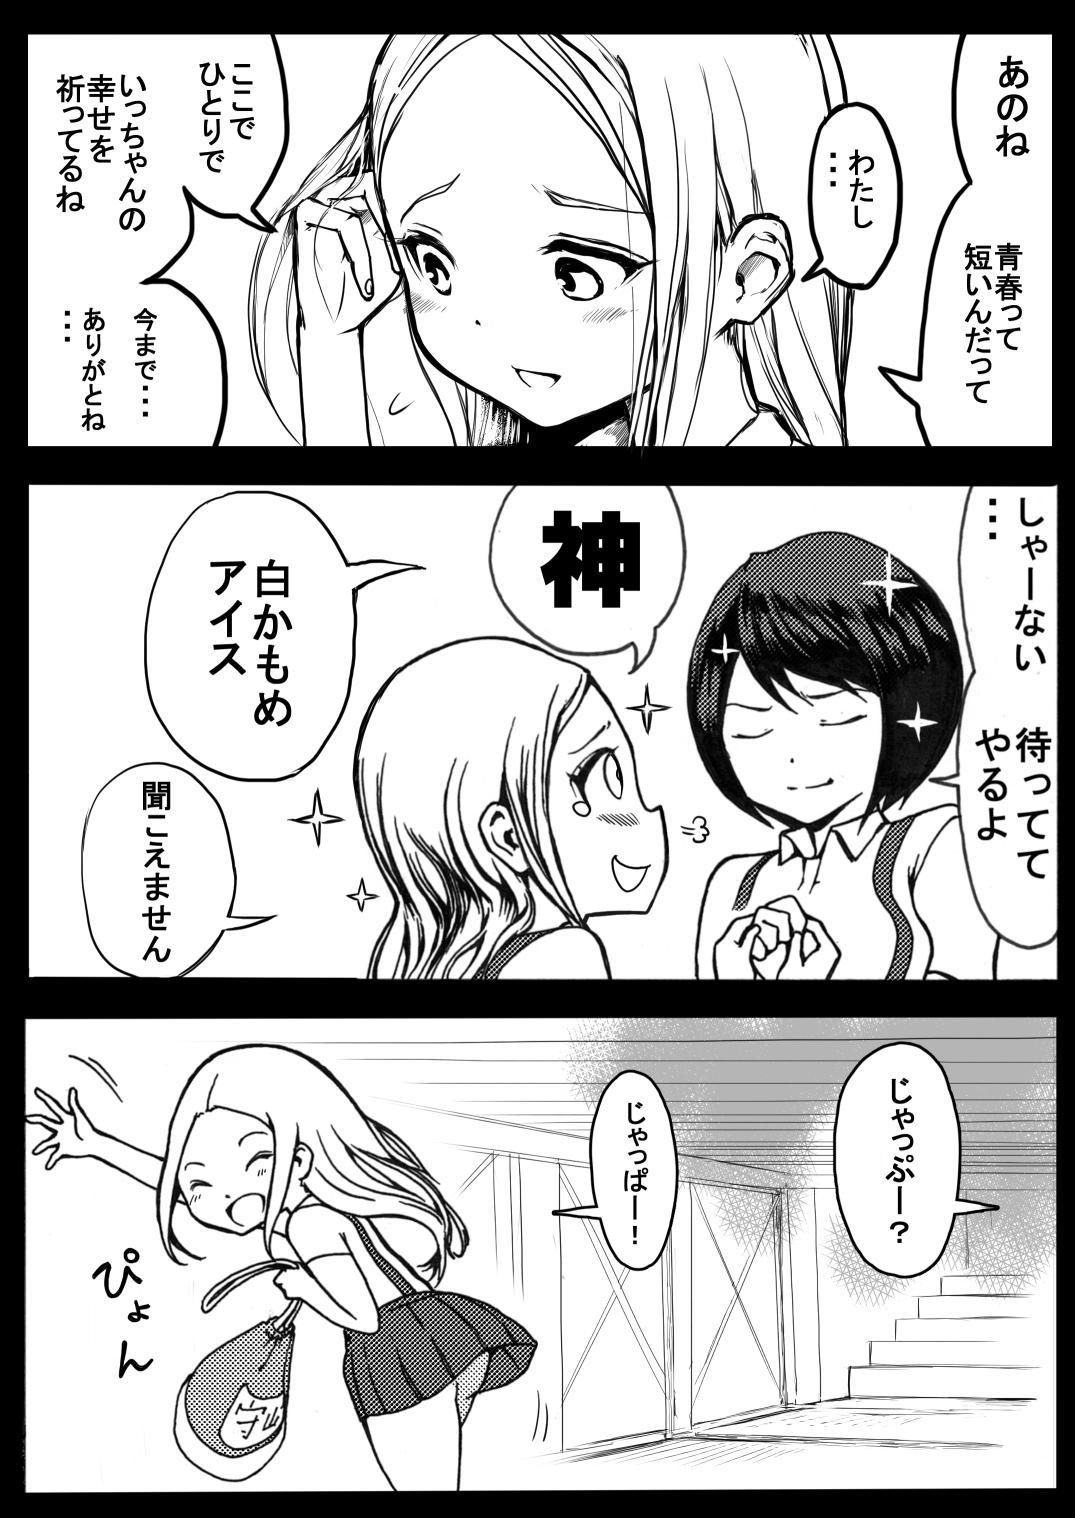 Sukumizu Senshi Ryona Manga 2-kan 2